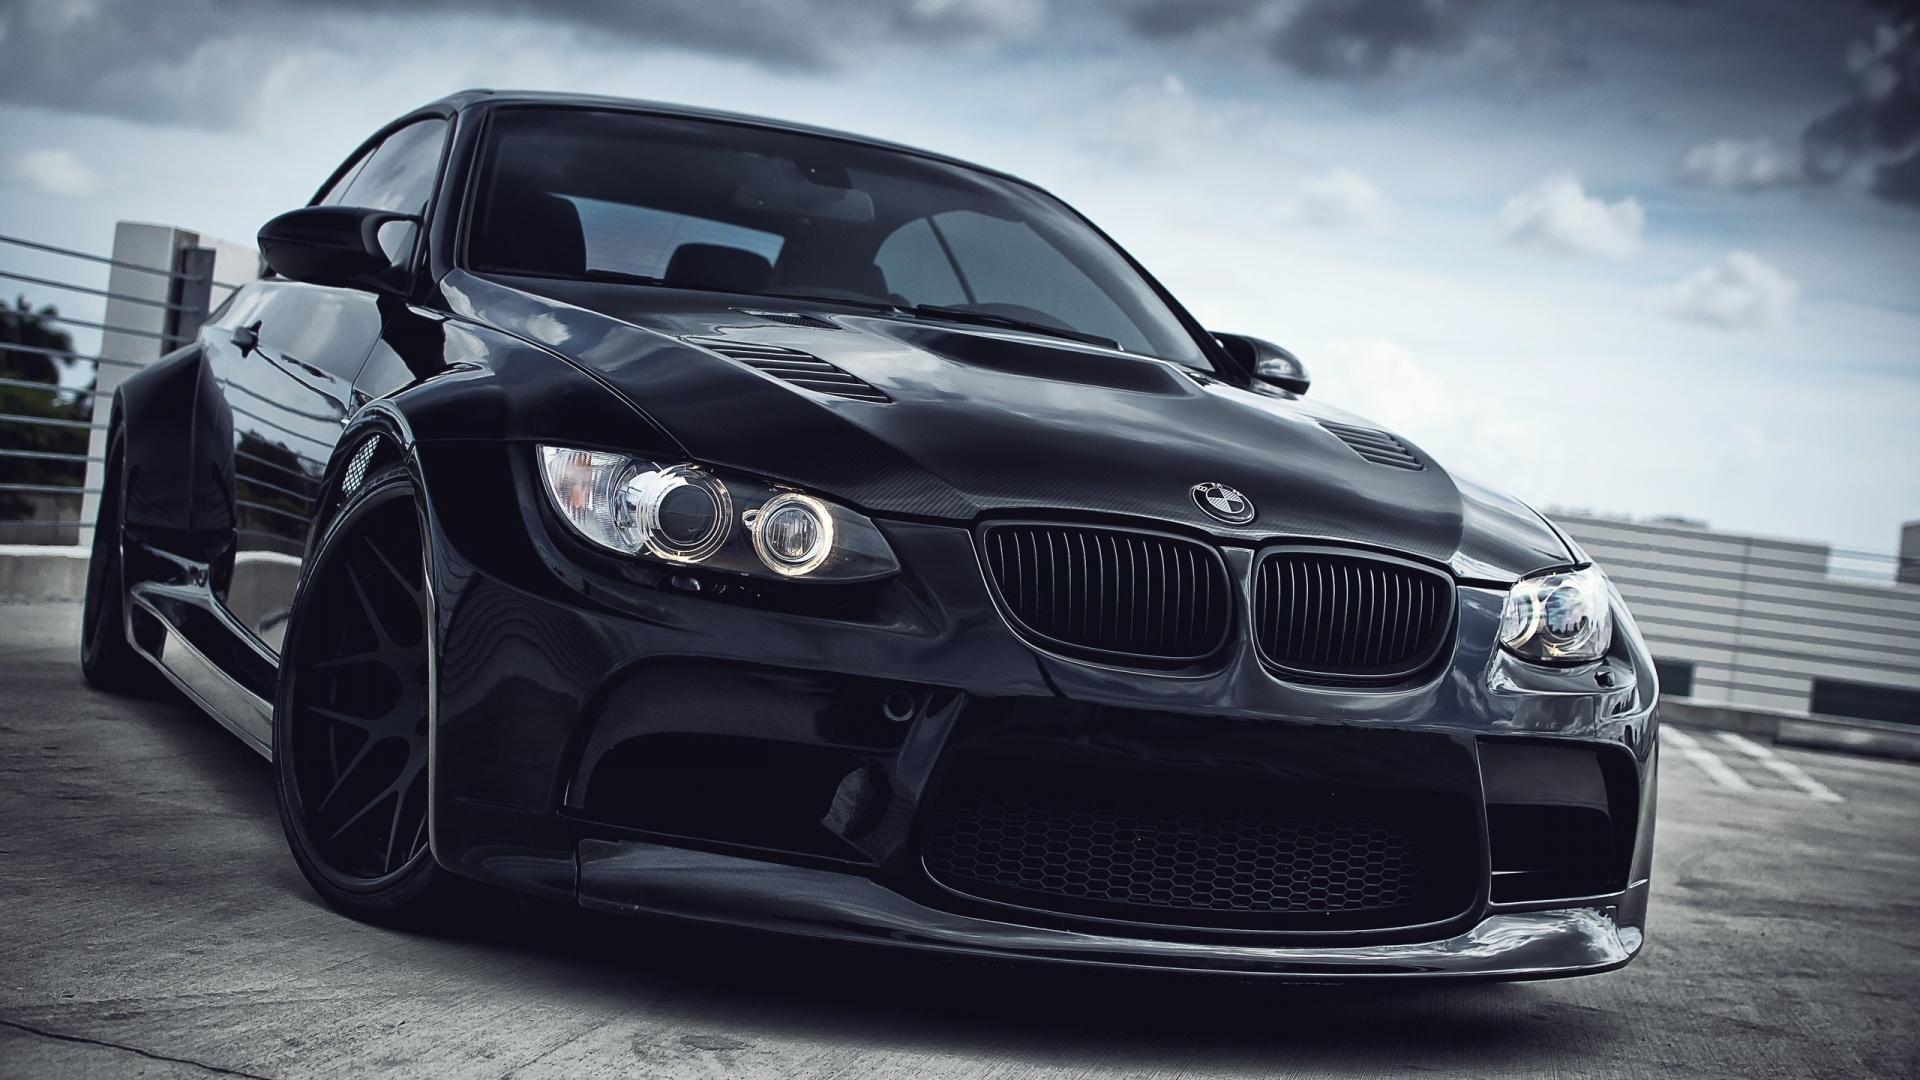 BMW M3 Wallpaper Windows Black Costom Wallpaper with 1920x1080 1920x1080